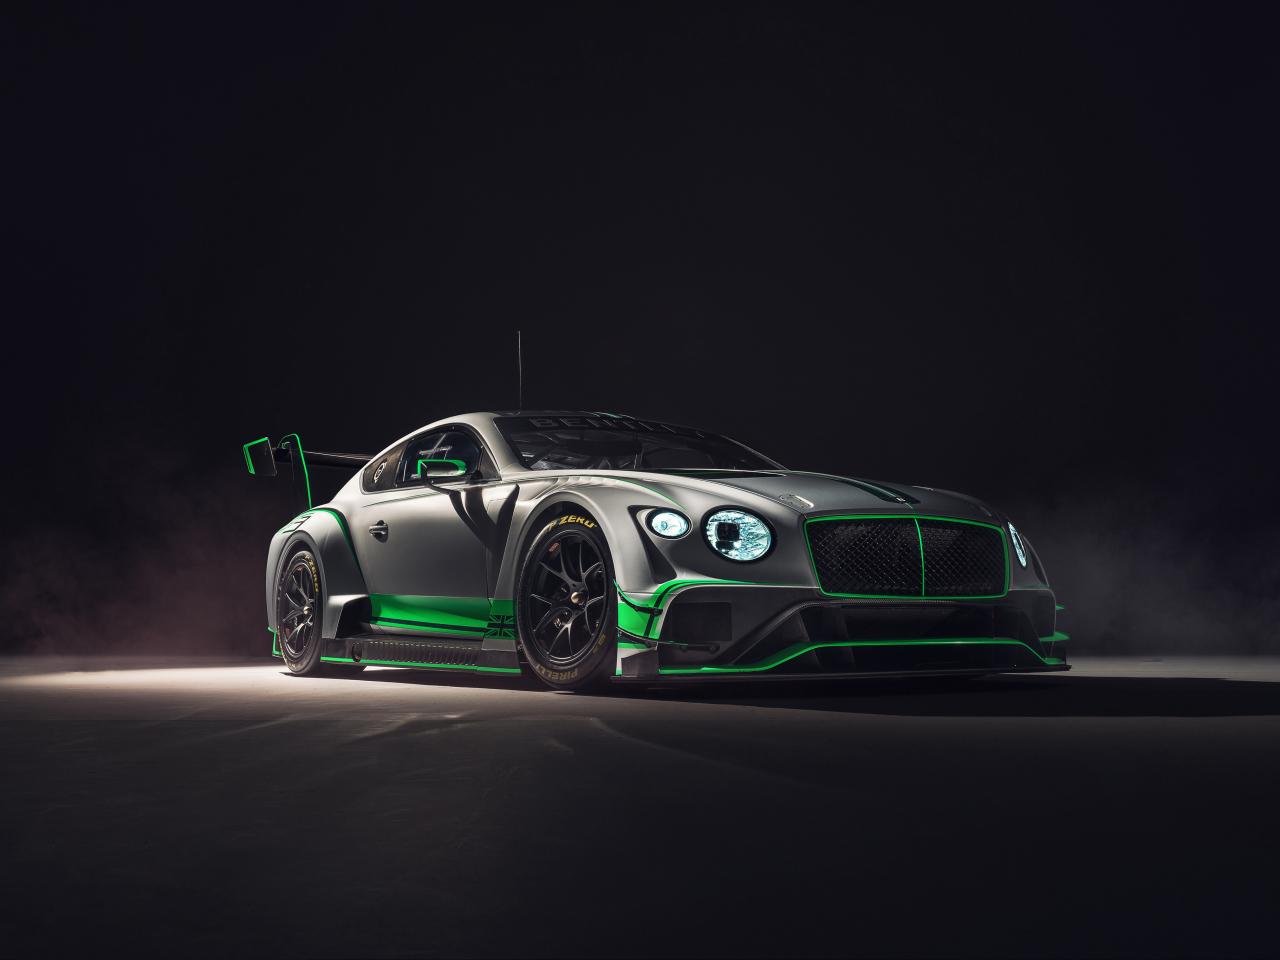 2018 Bentley Continental GT3, 2018 luxury car, 1280x960 wallpaper